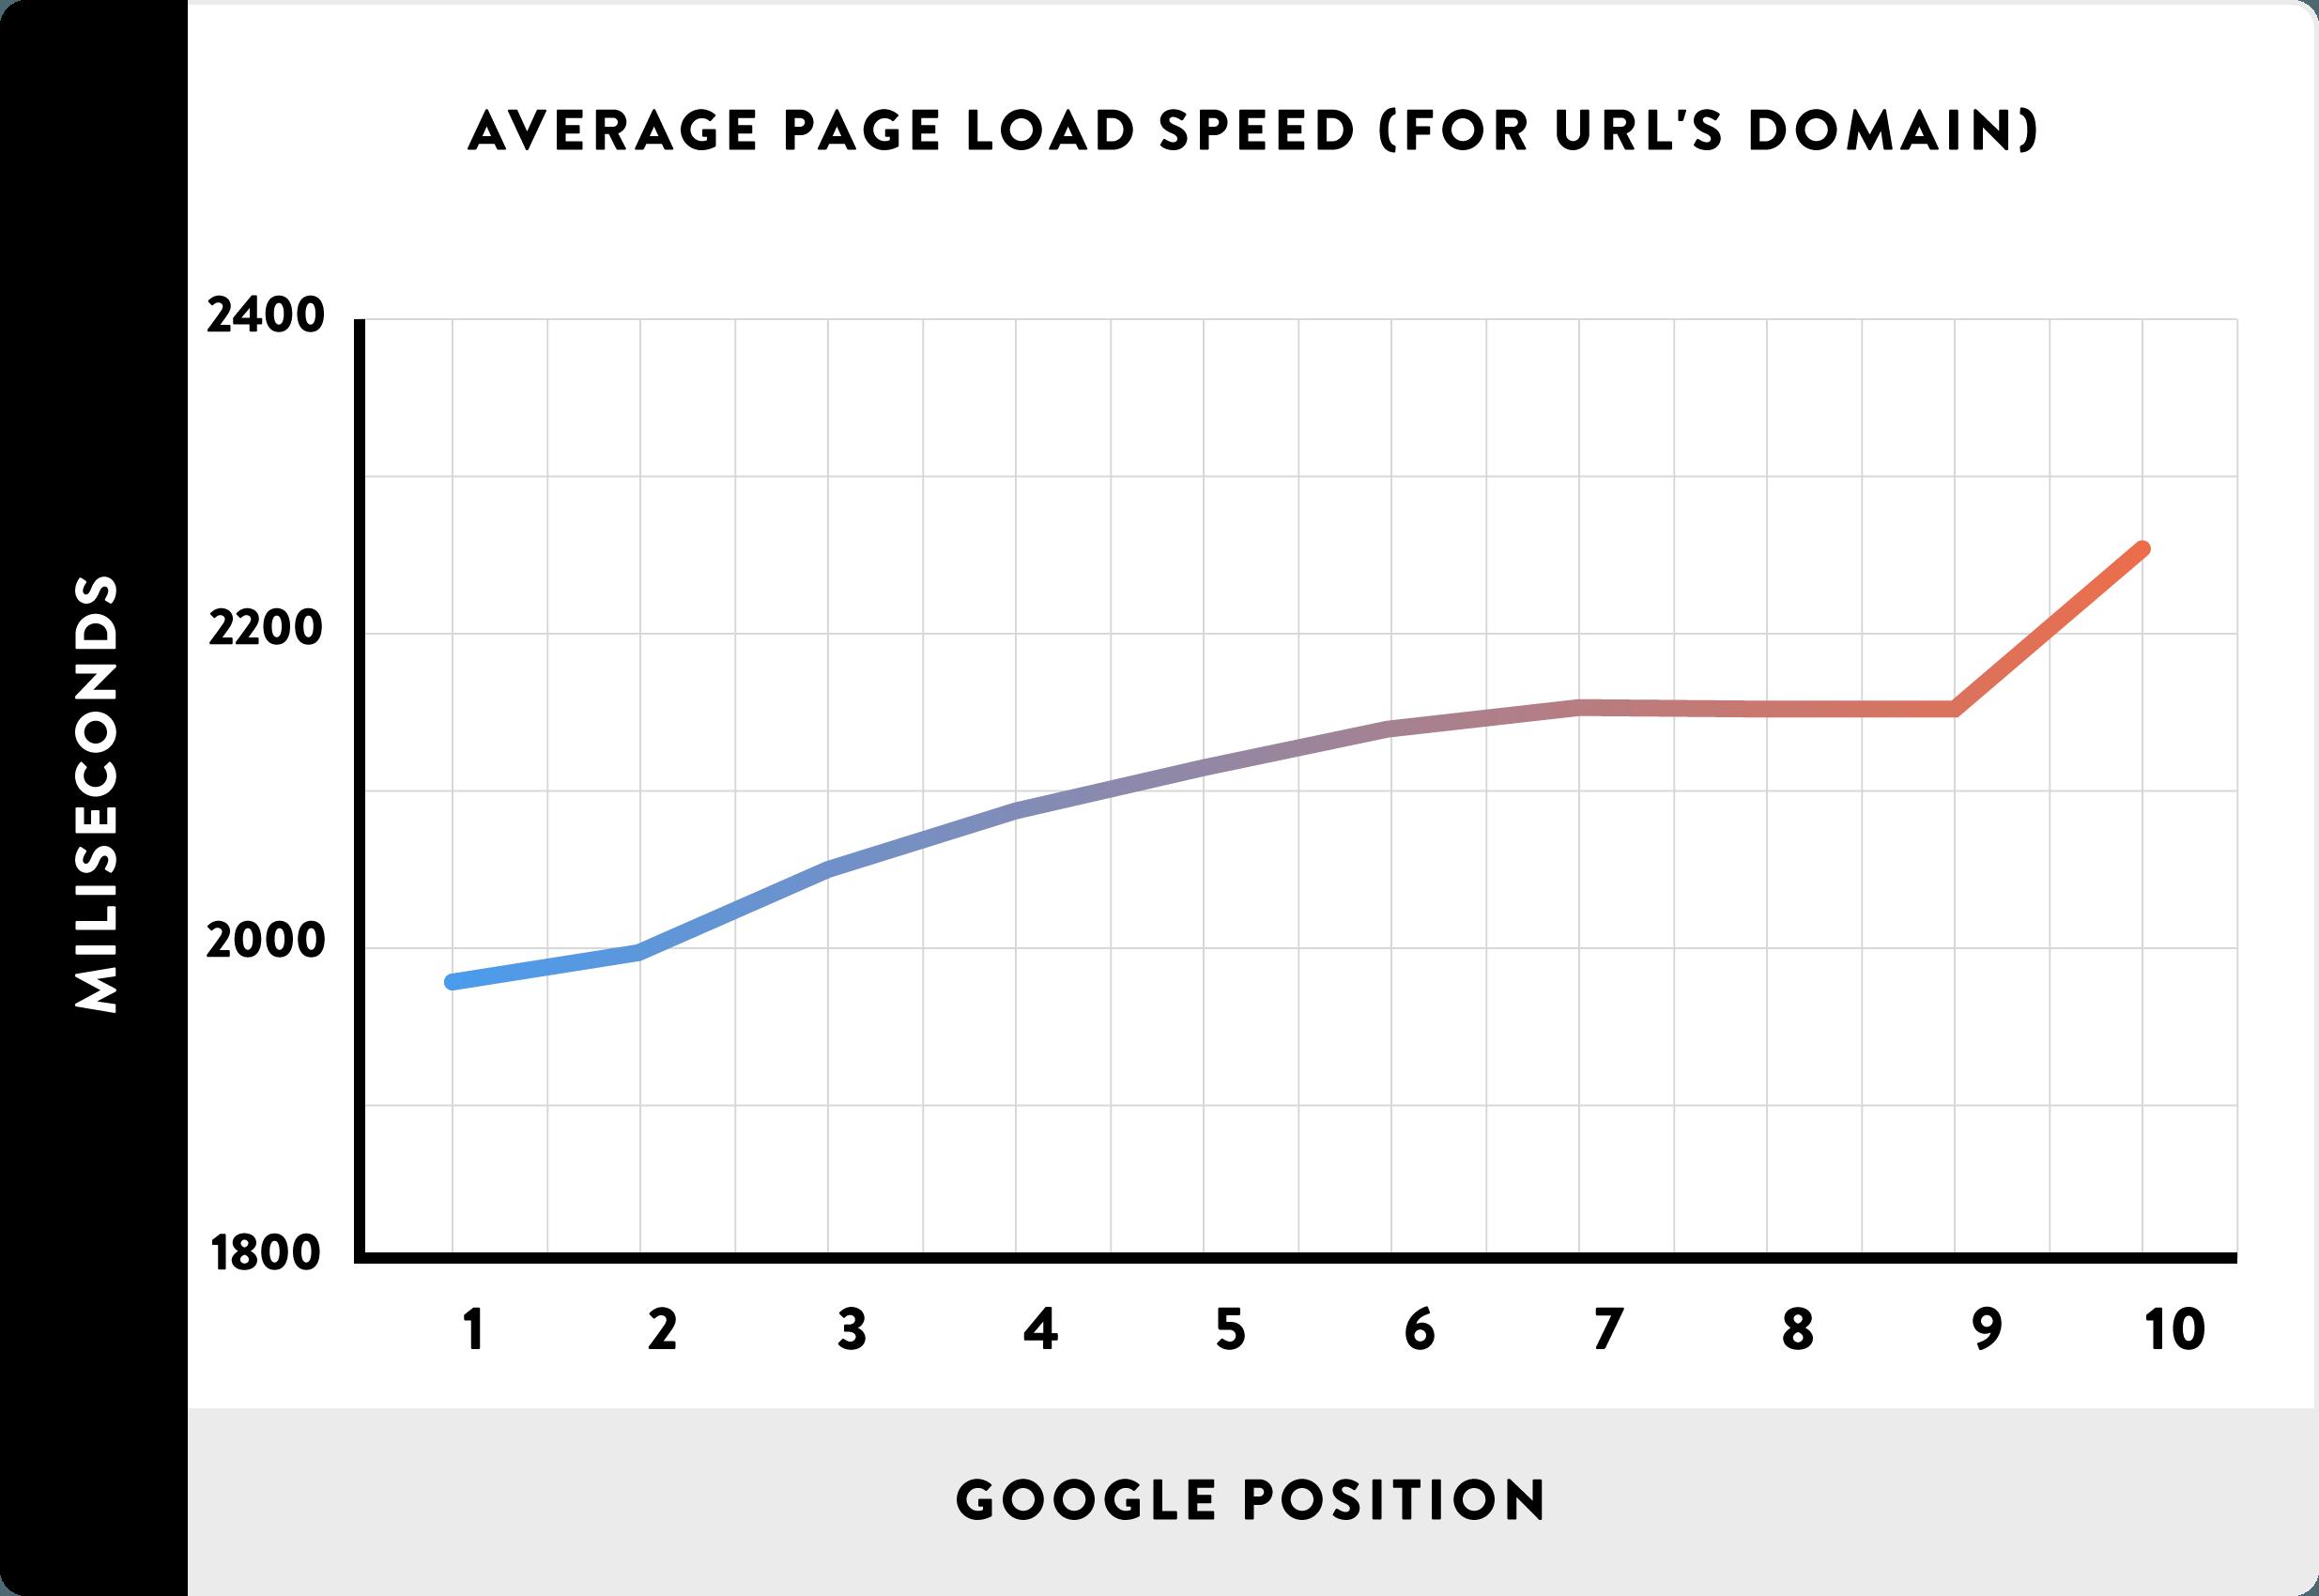 01-velocidade-media-carregamento-de-URLs-dominios